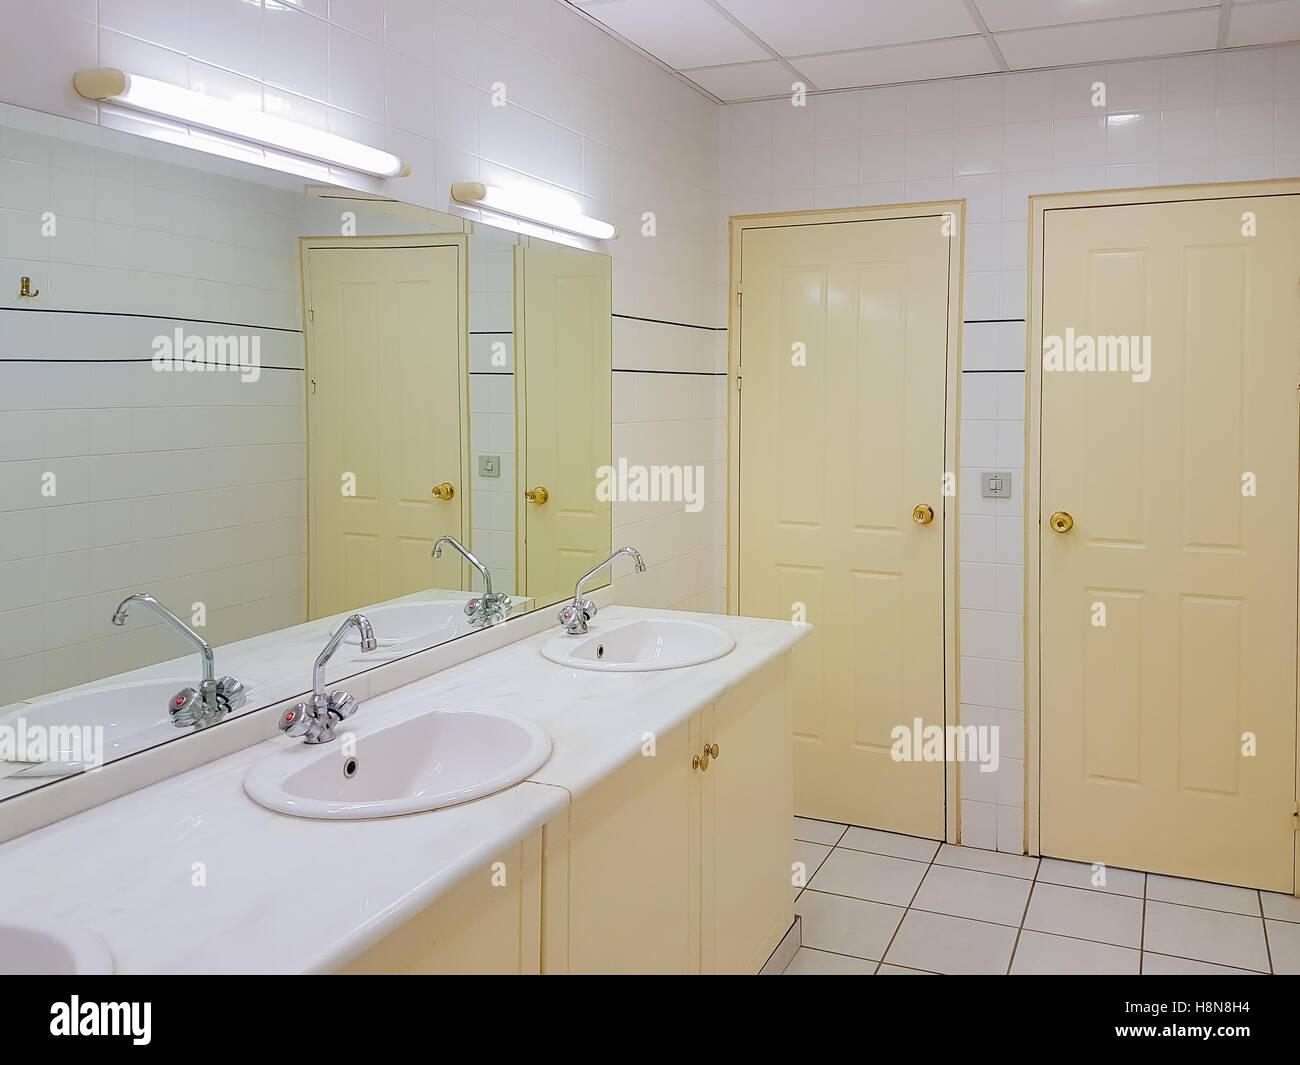 Interior design of a clean public toilet Stock Photo: 125857568 - Alamy